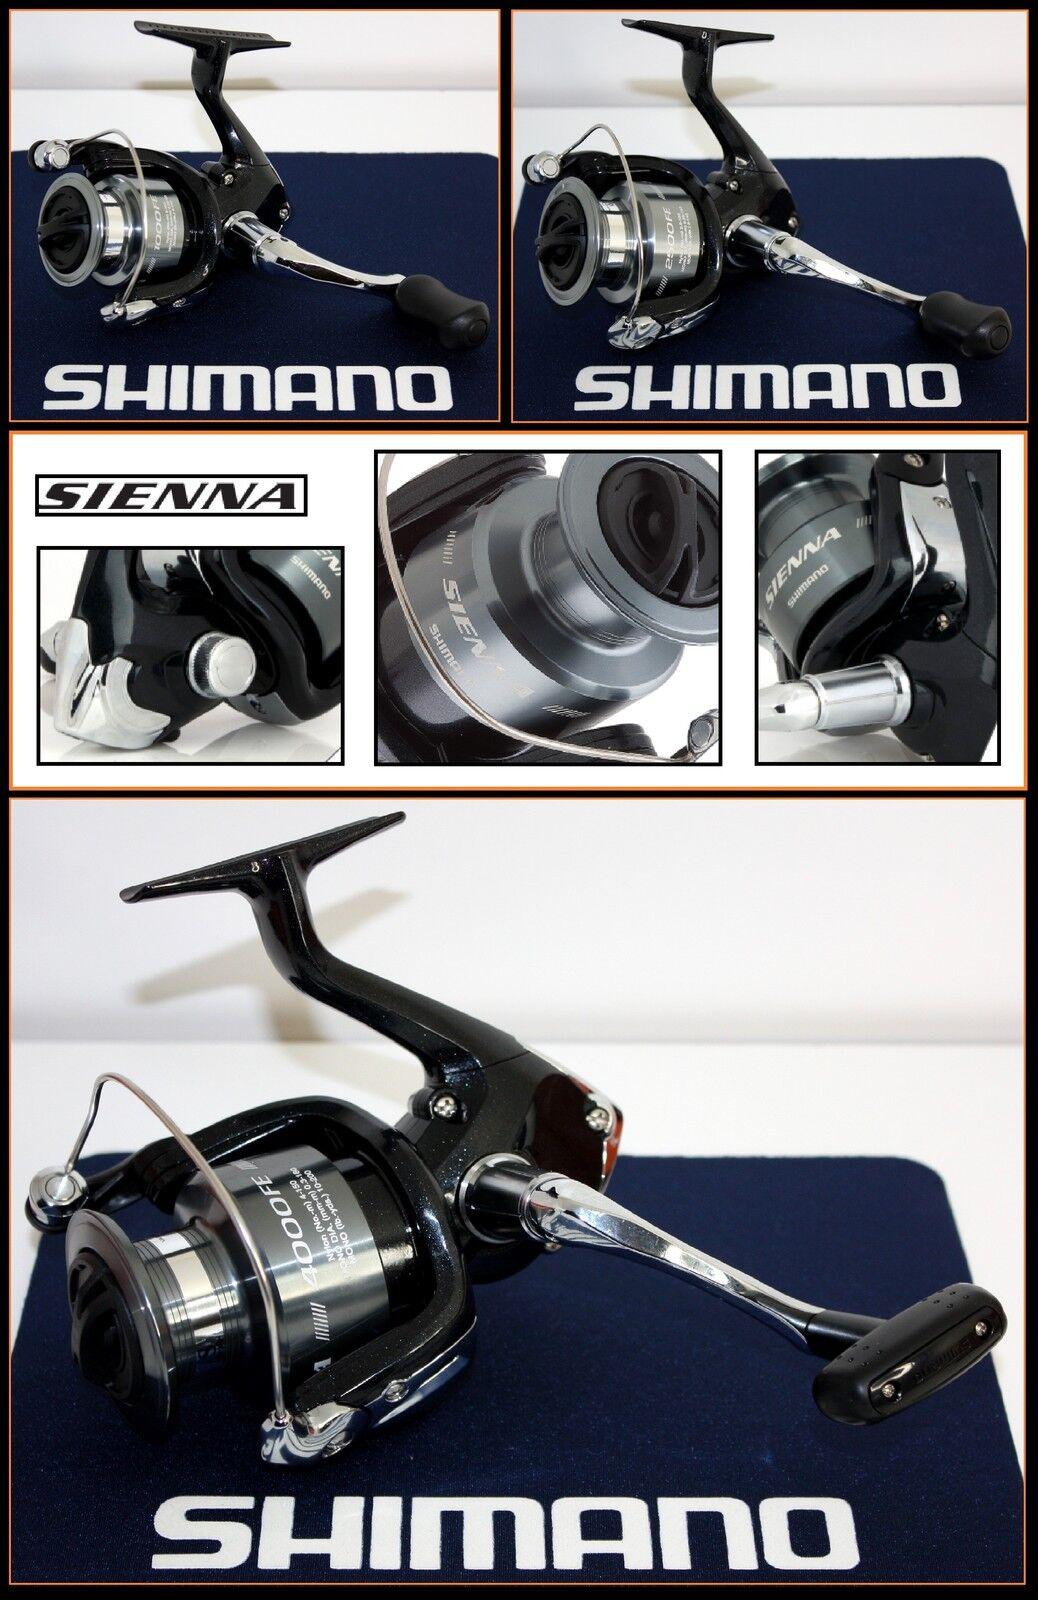 Shimano Sienna FE 1000 2500 4000 Frontbremse 1000FE 2500FE 4000FE NEW OVP